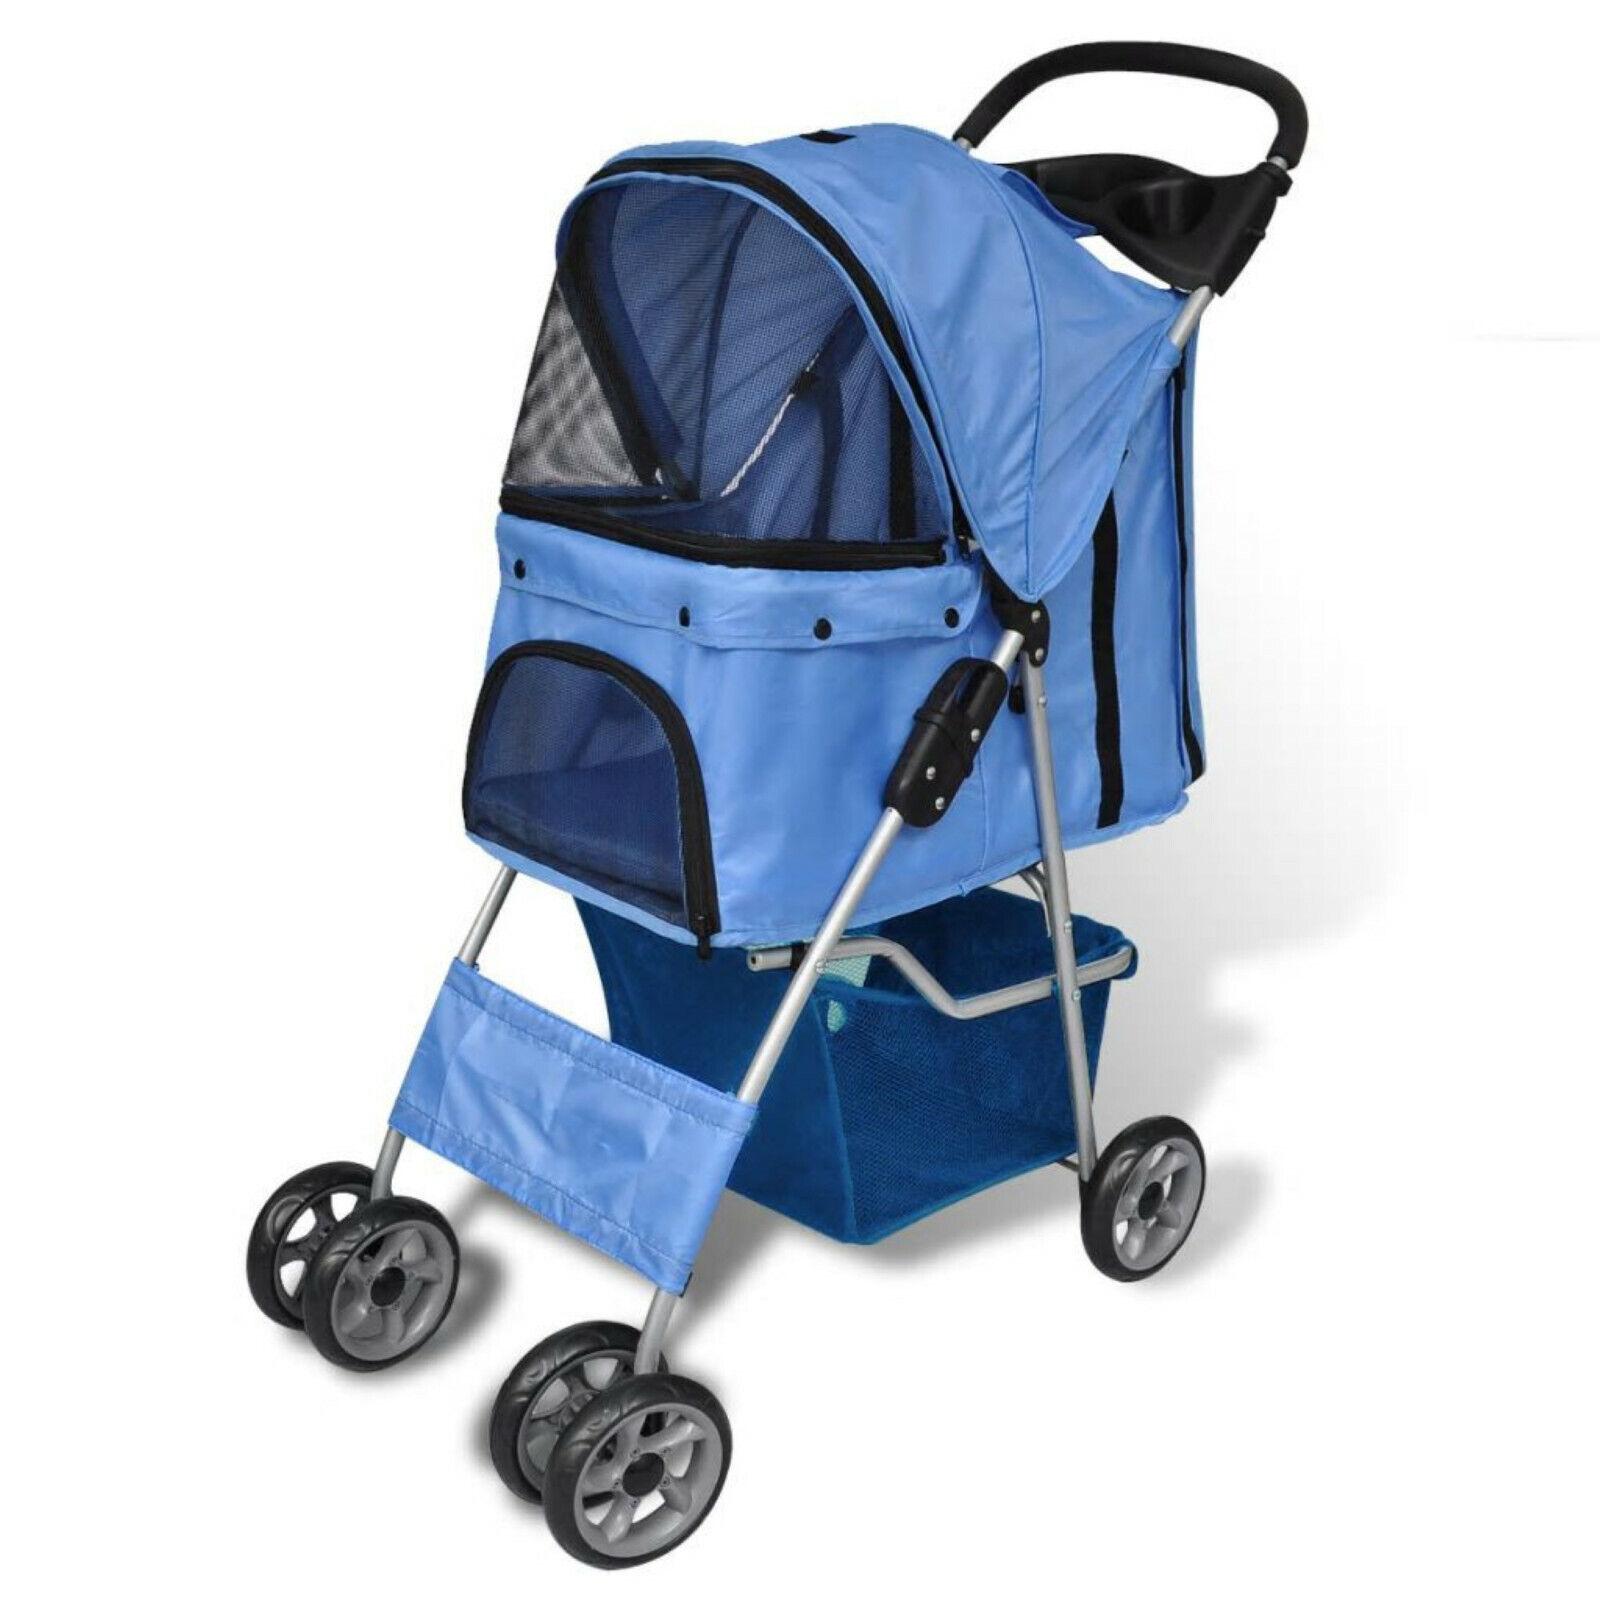 Folding Pet Stroller Travel Carrier with Storage Basket Dog Cat Trolley Blau